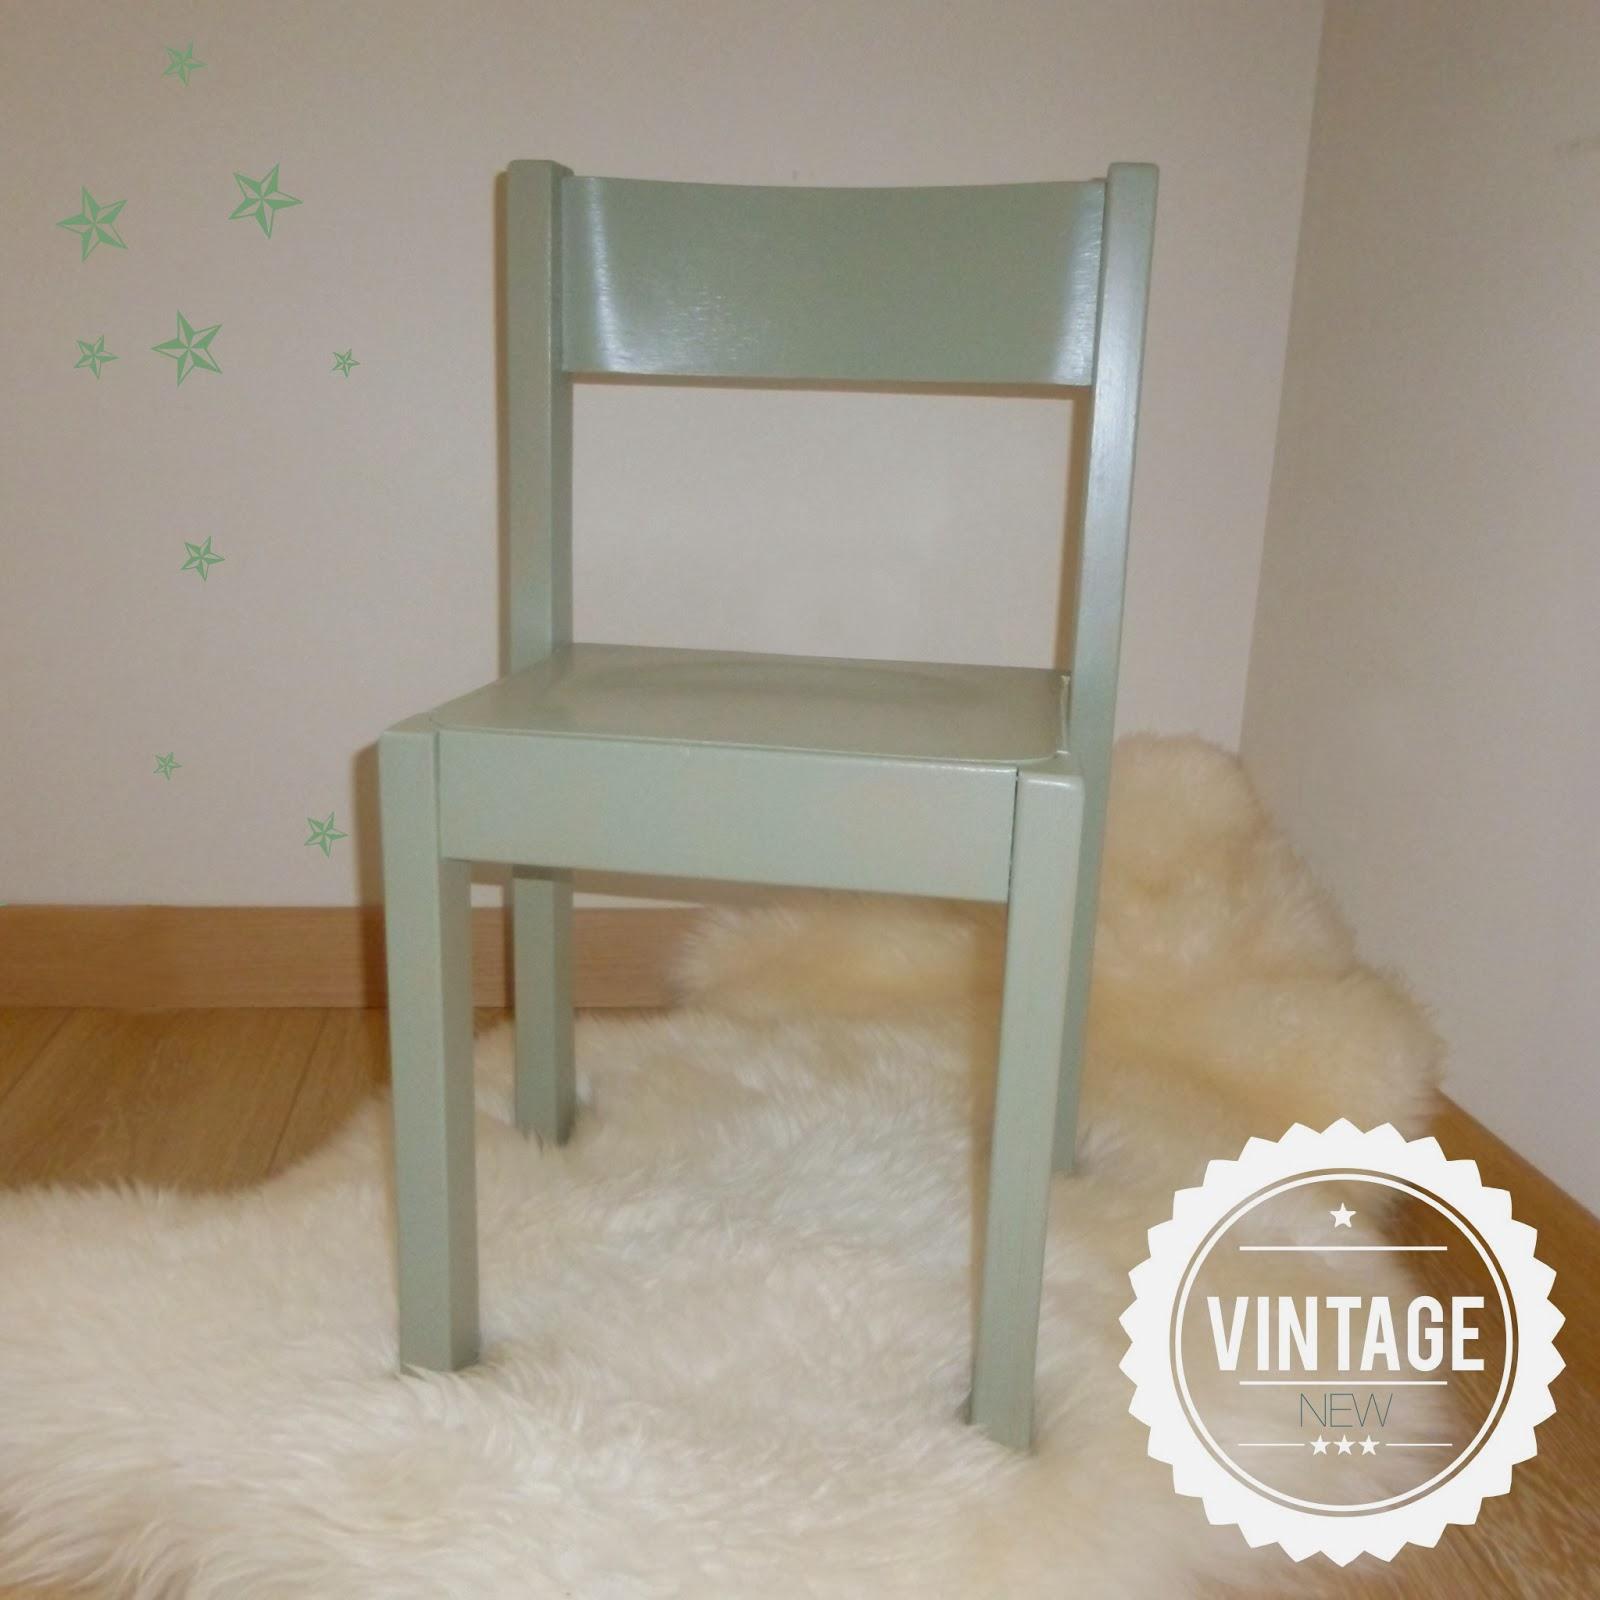 vintage trendy petite chaise enfant vintage. Black Bedroom Furniture Sets. Home Design Ideas